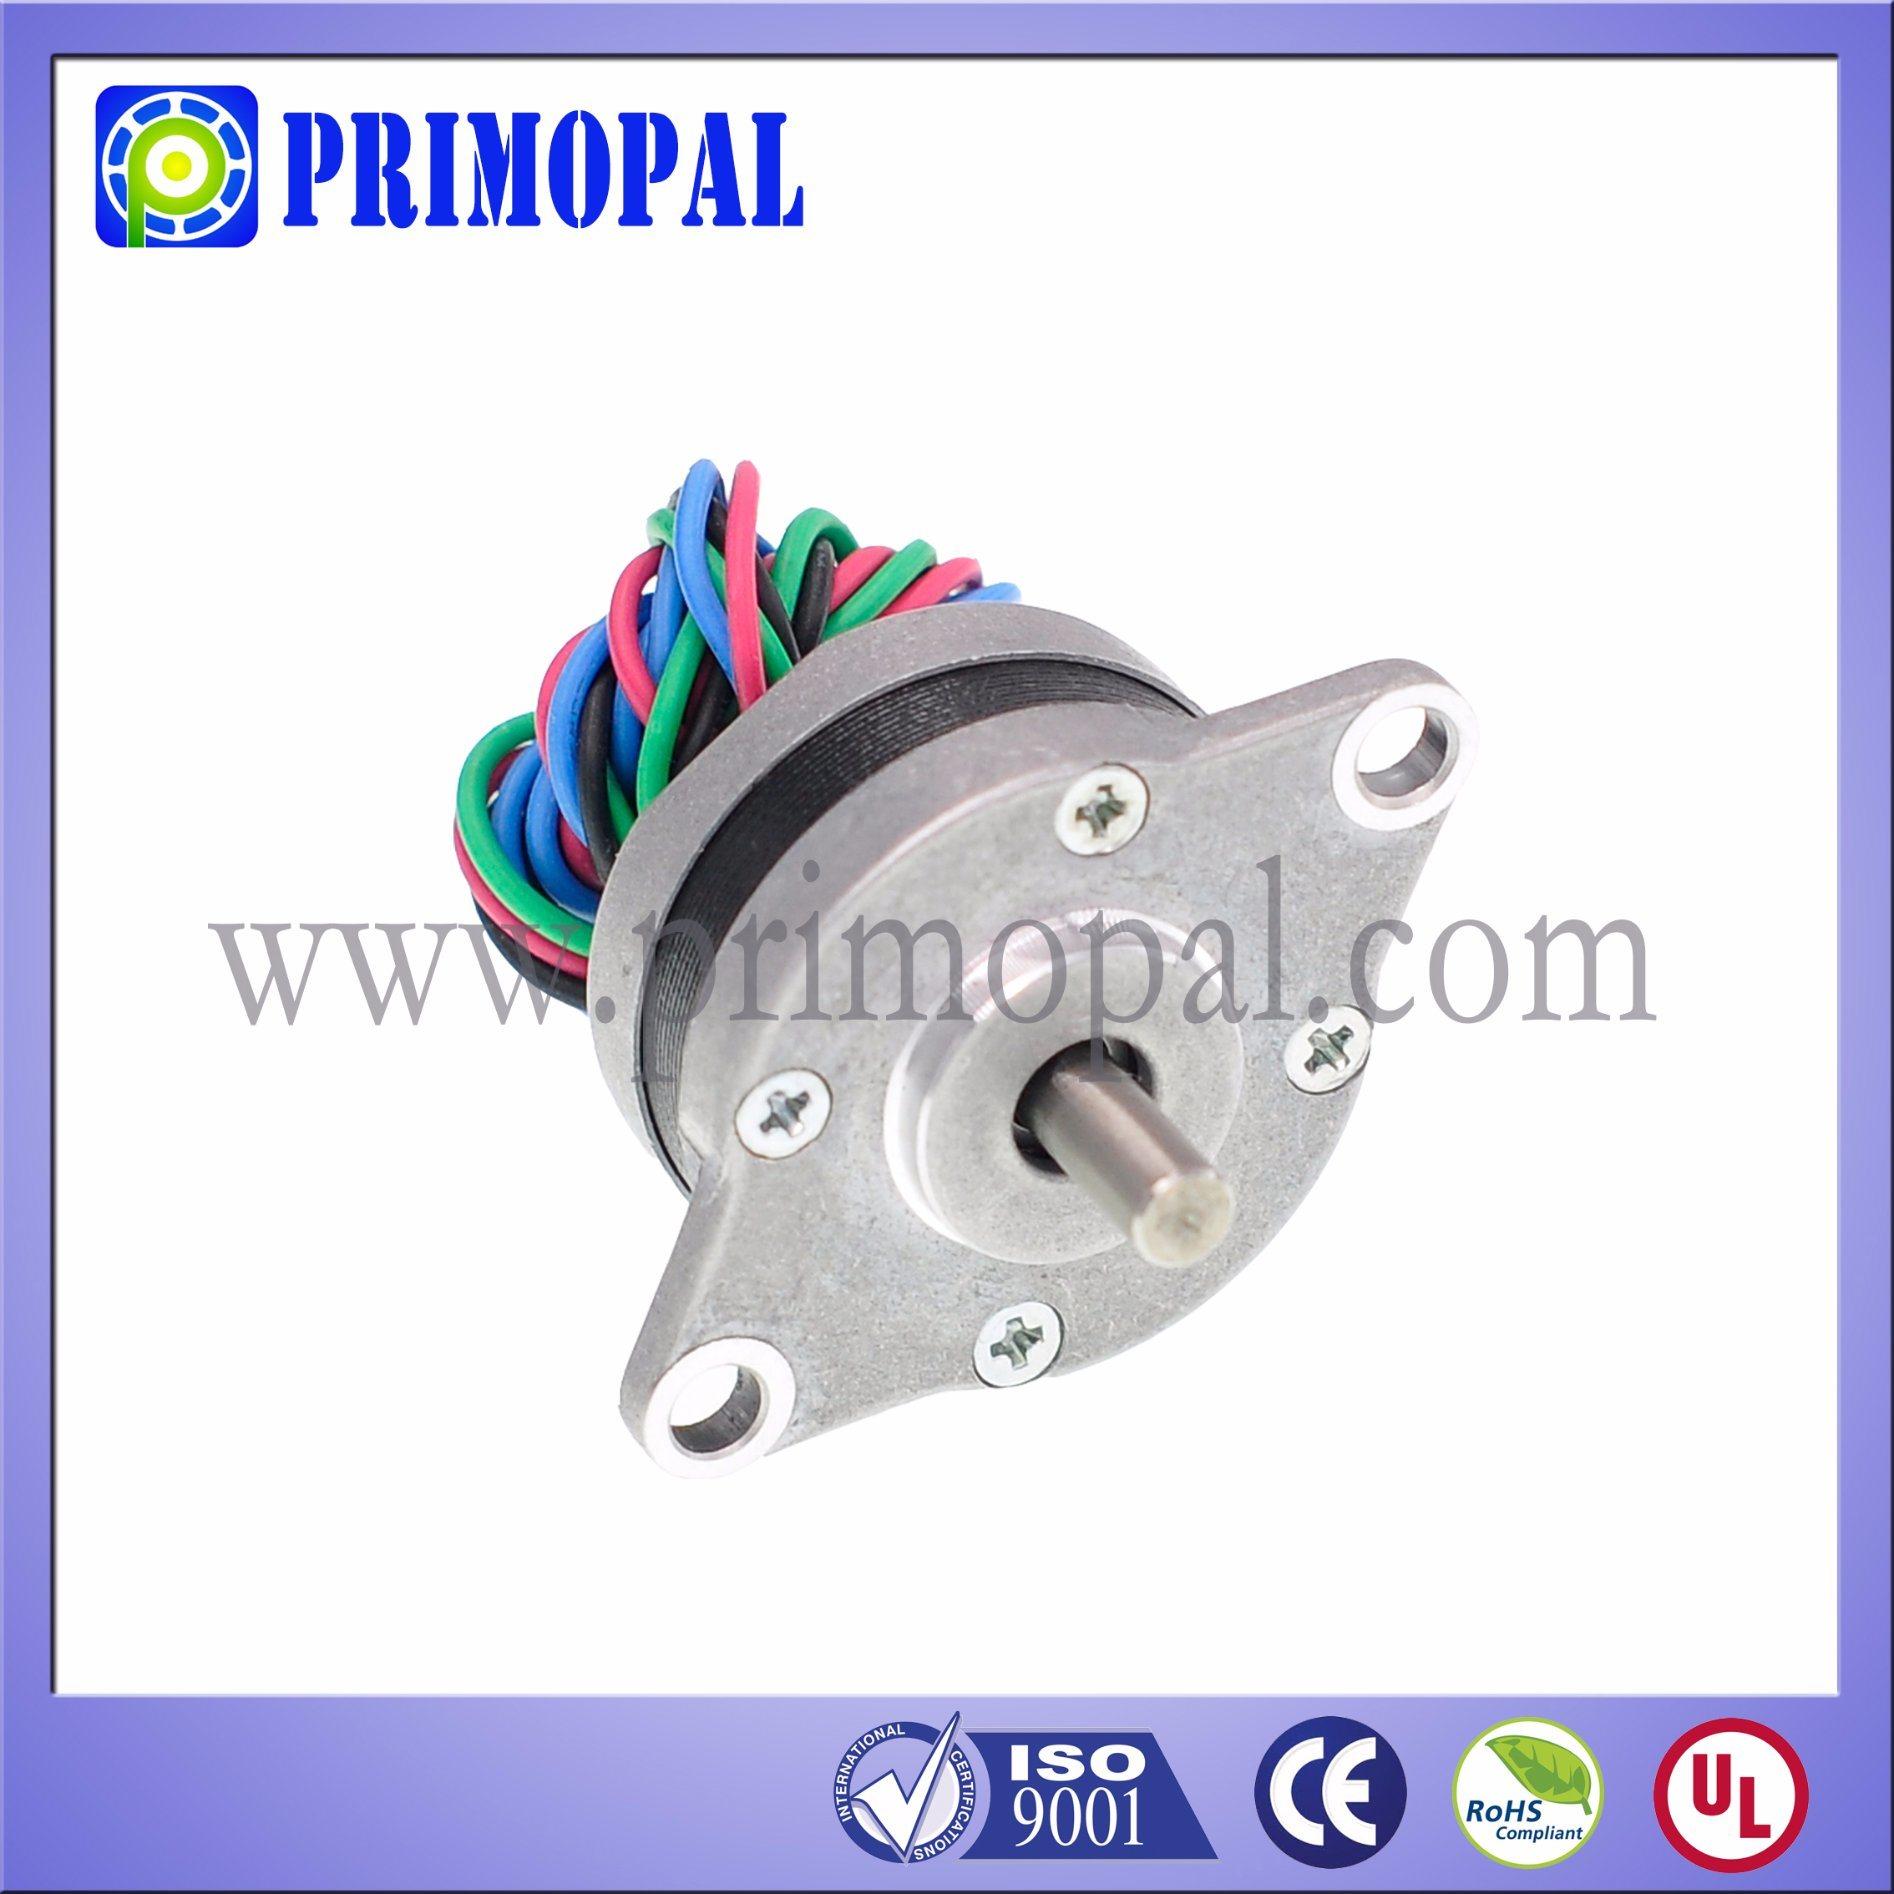 1.8 Step Angle NEMA 10 Round Micro Stepper Motor